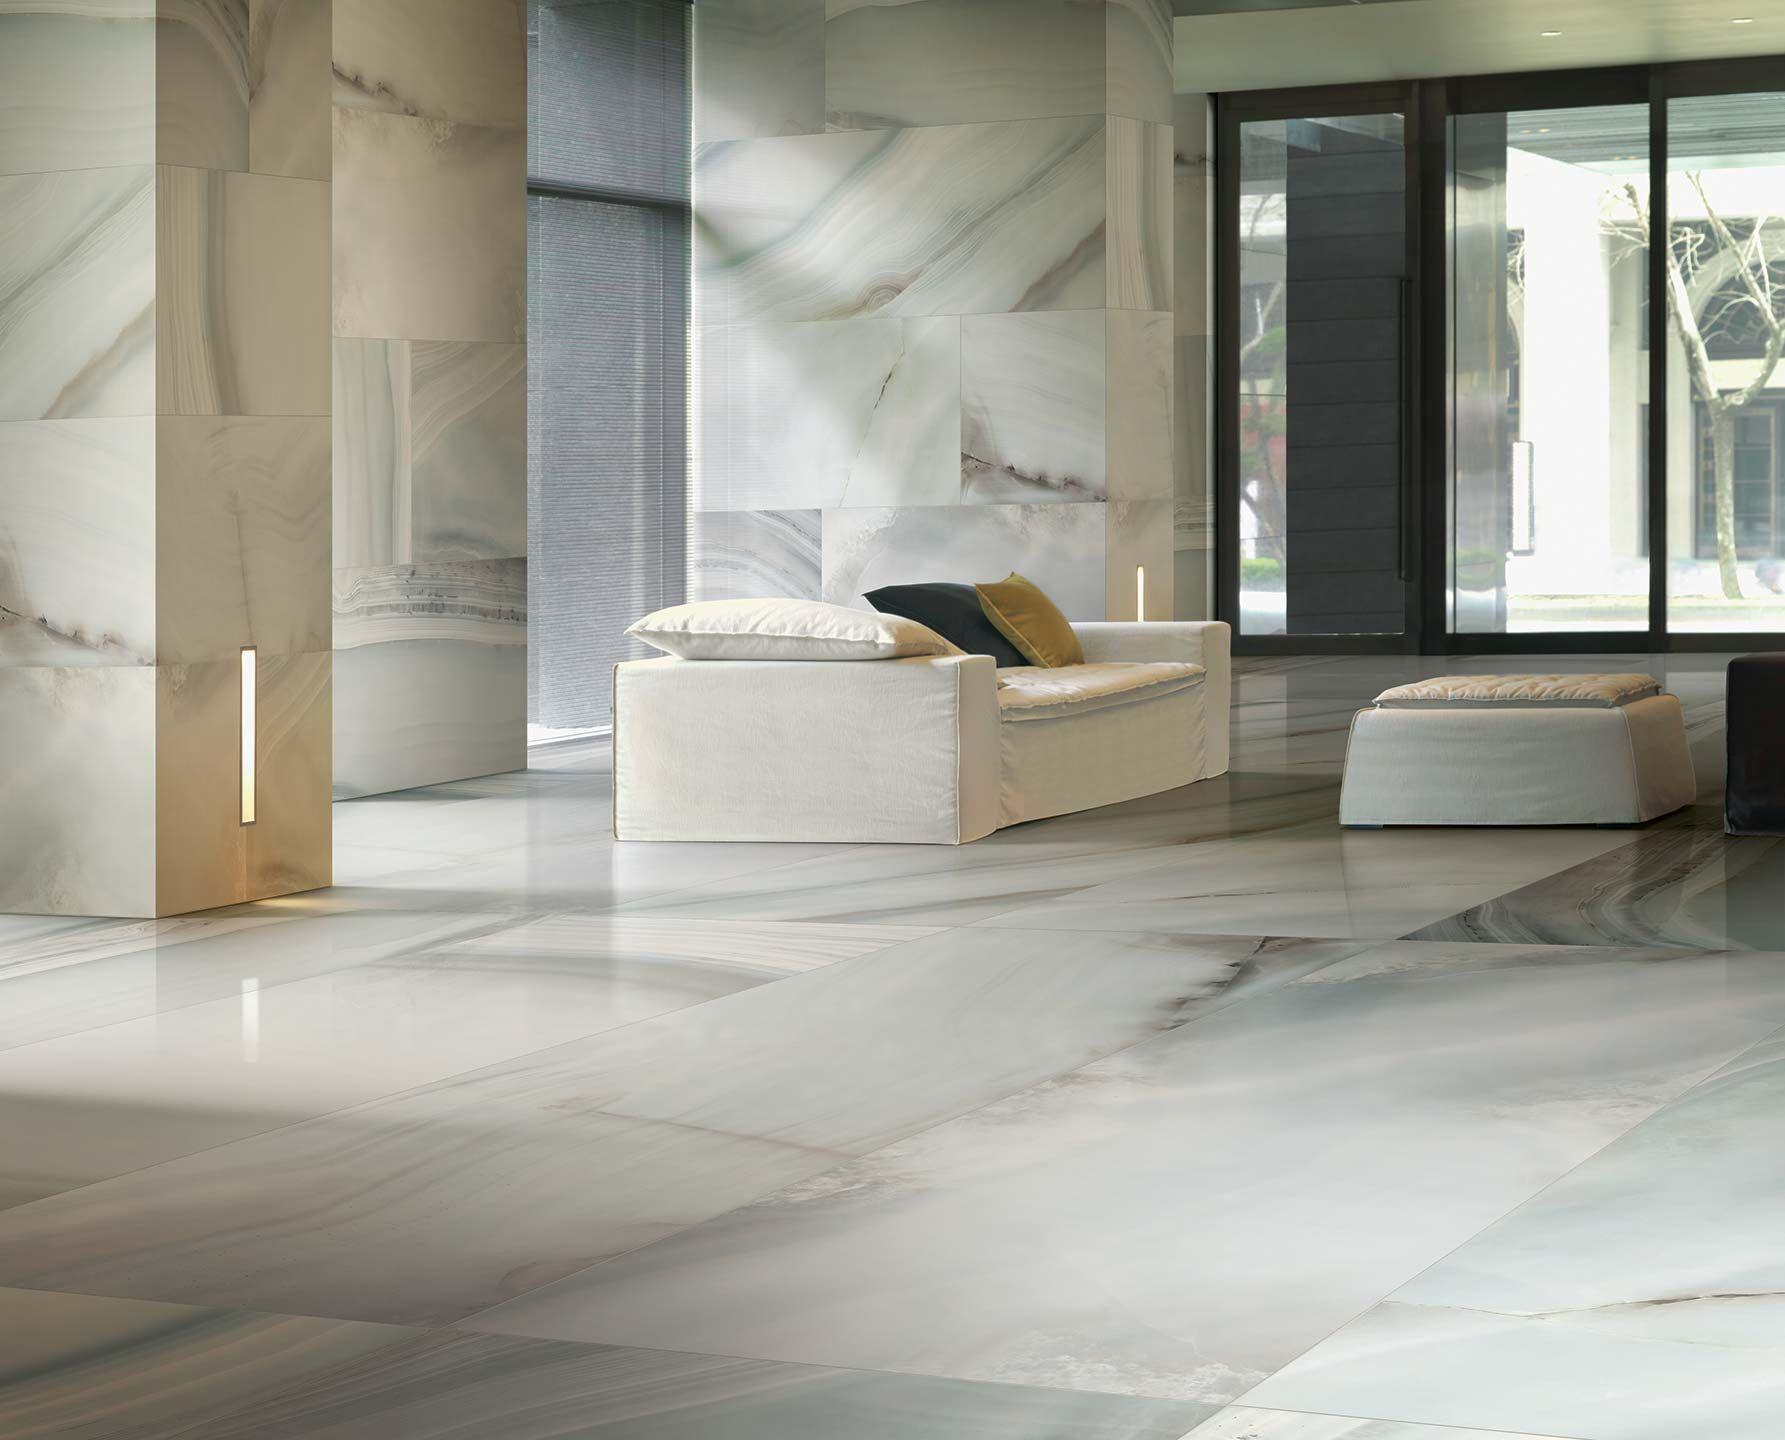 alabaster marble flooring of shiny